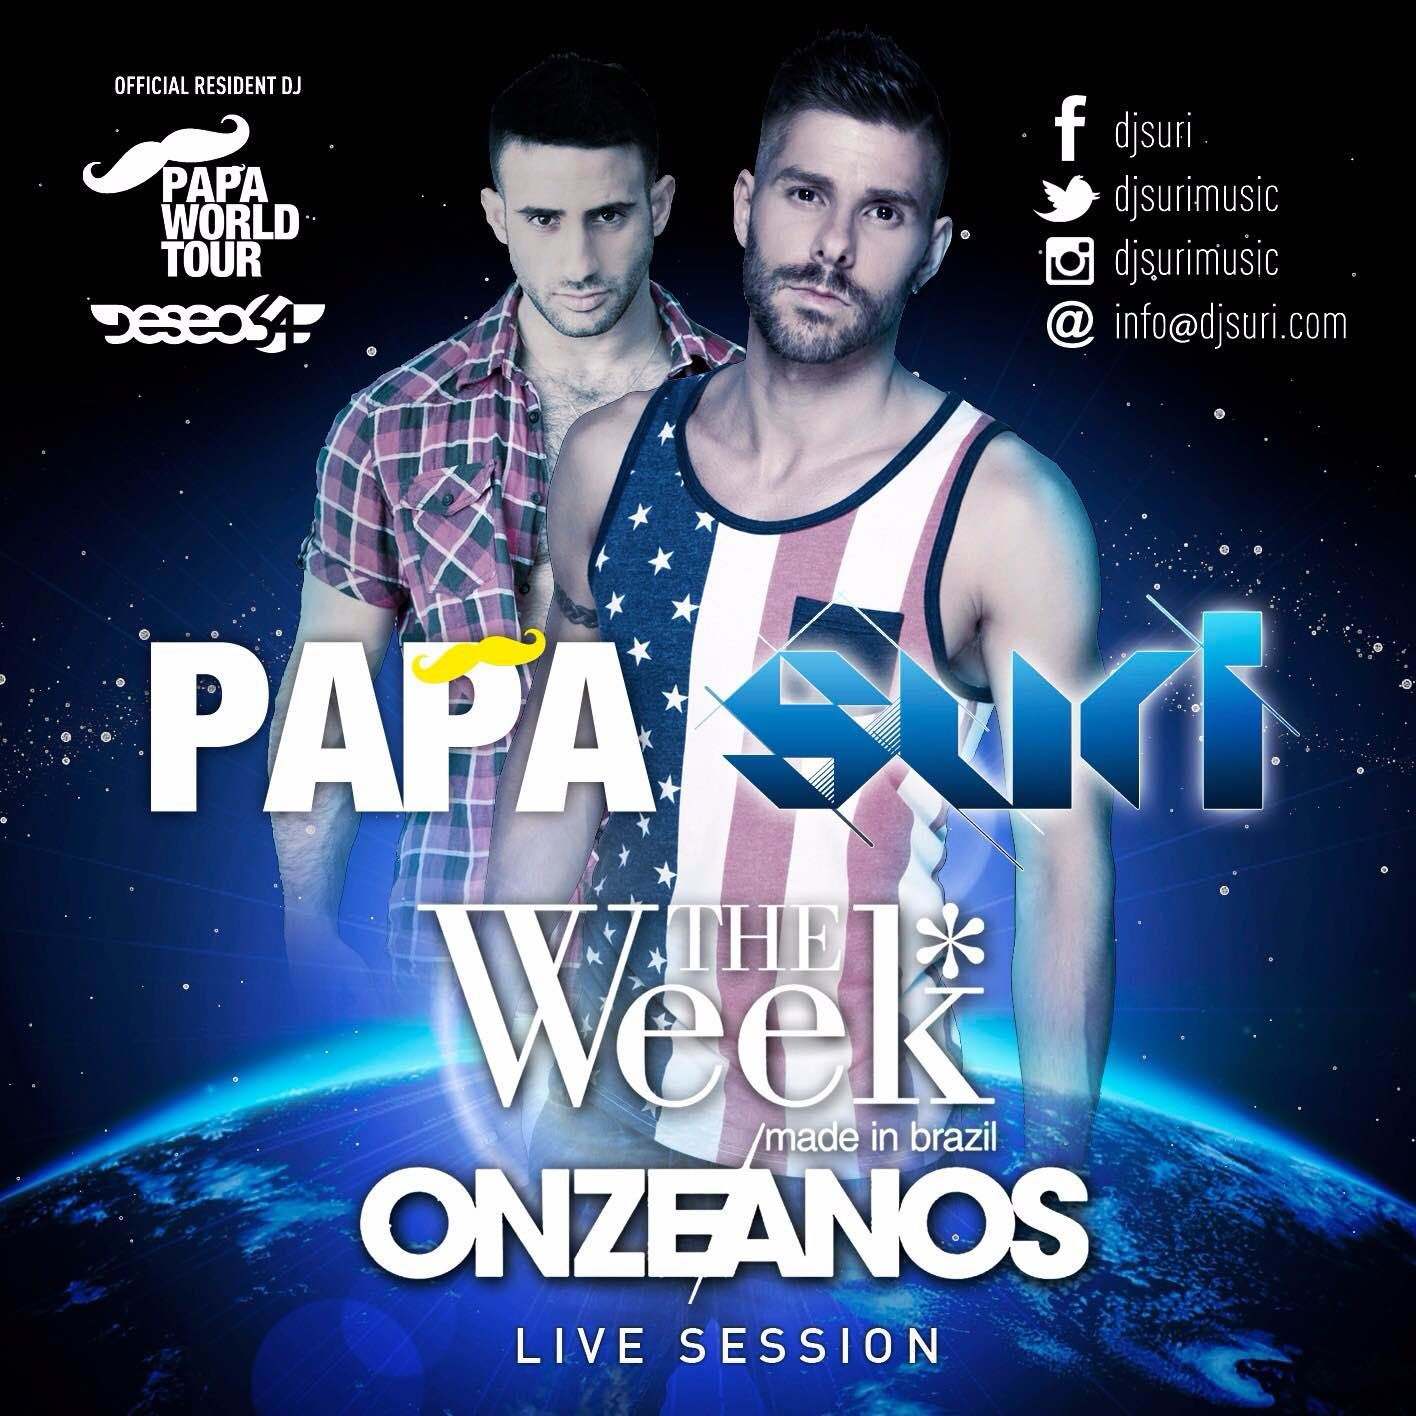 DJ Suri - Papa Live Set at The Week 11 Annyversary